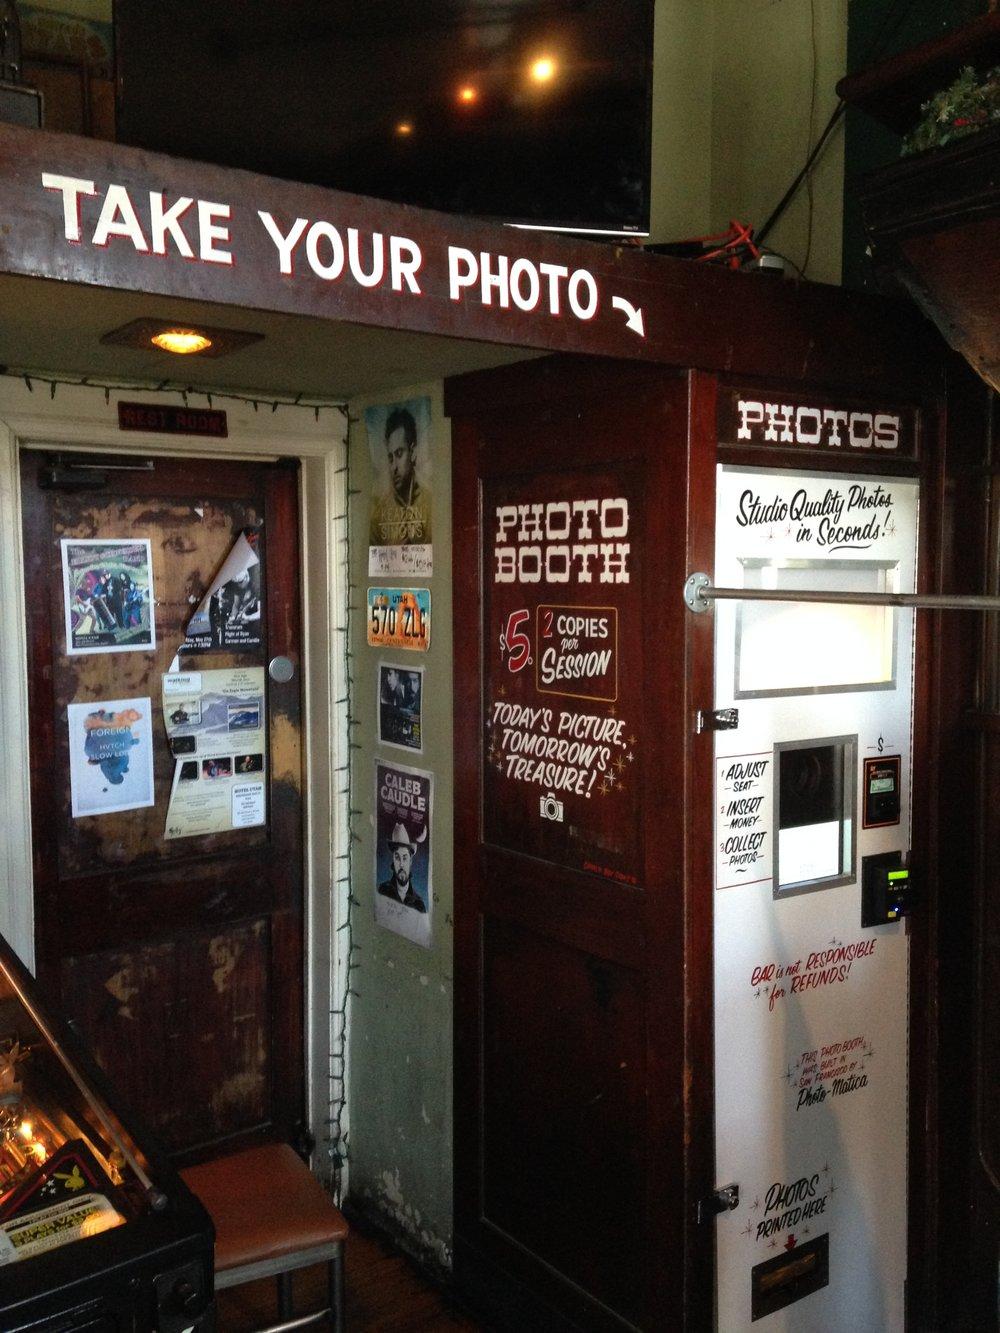 Hotel Utah Photo Booth